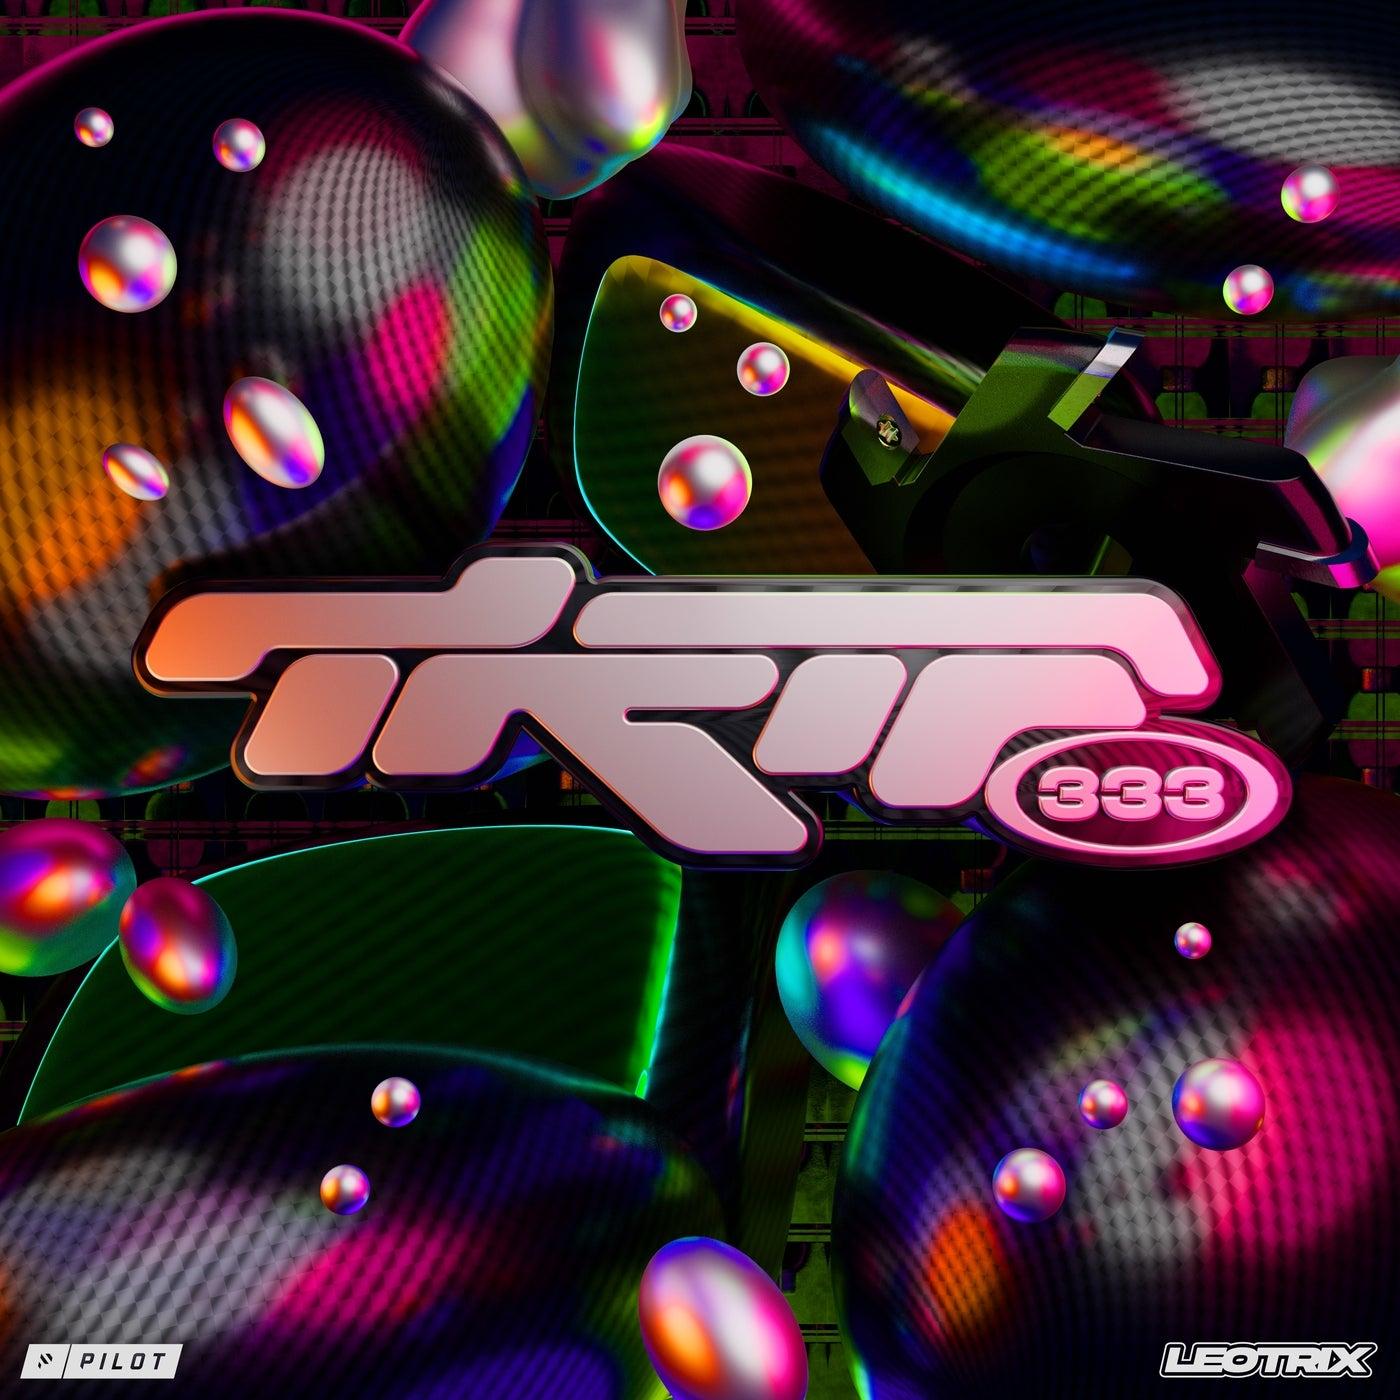 TRIP333 (Original Mix)